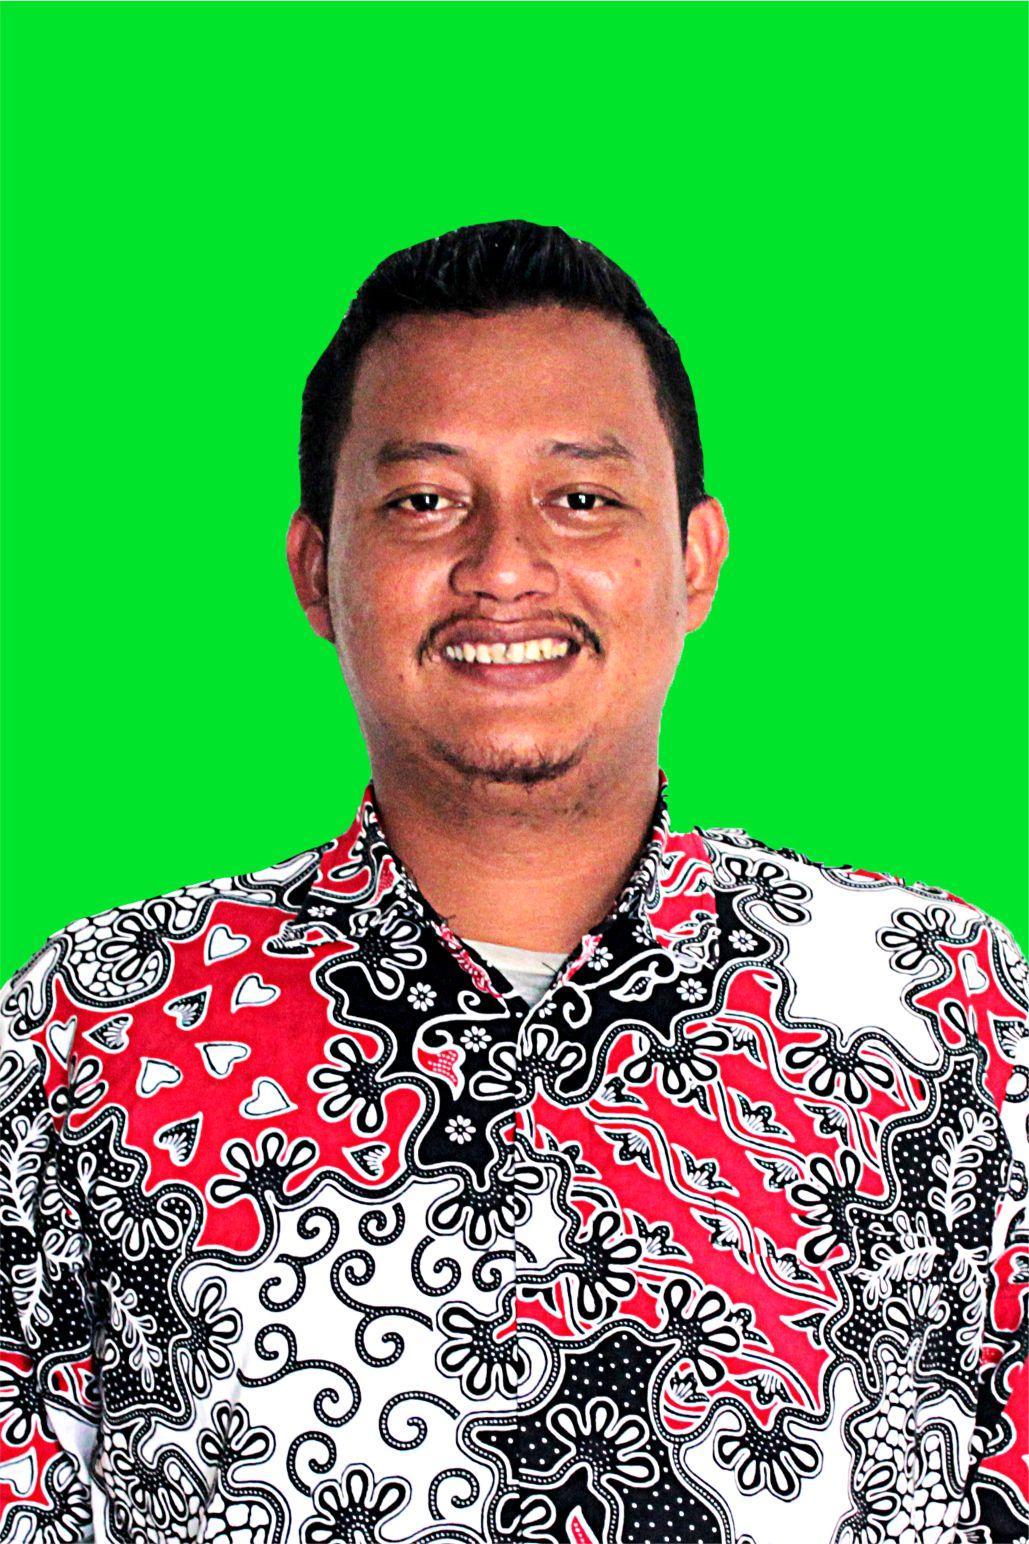 Staff Rasyid Marta Ela, ST SMK Taruna Harapan 1 Cipatat